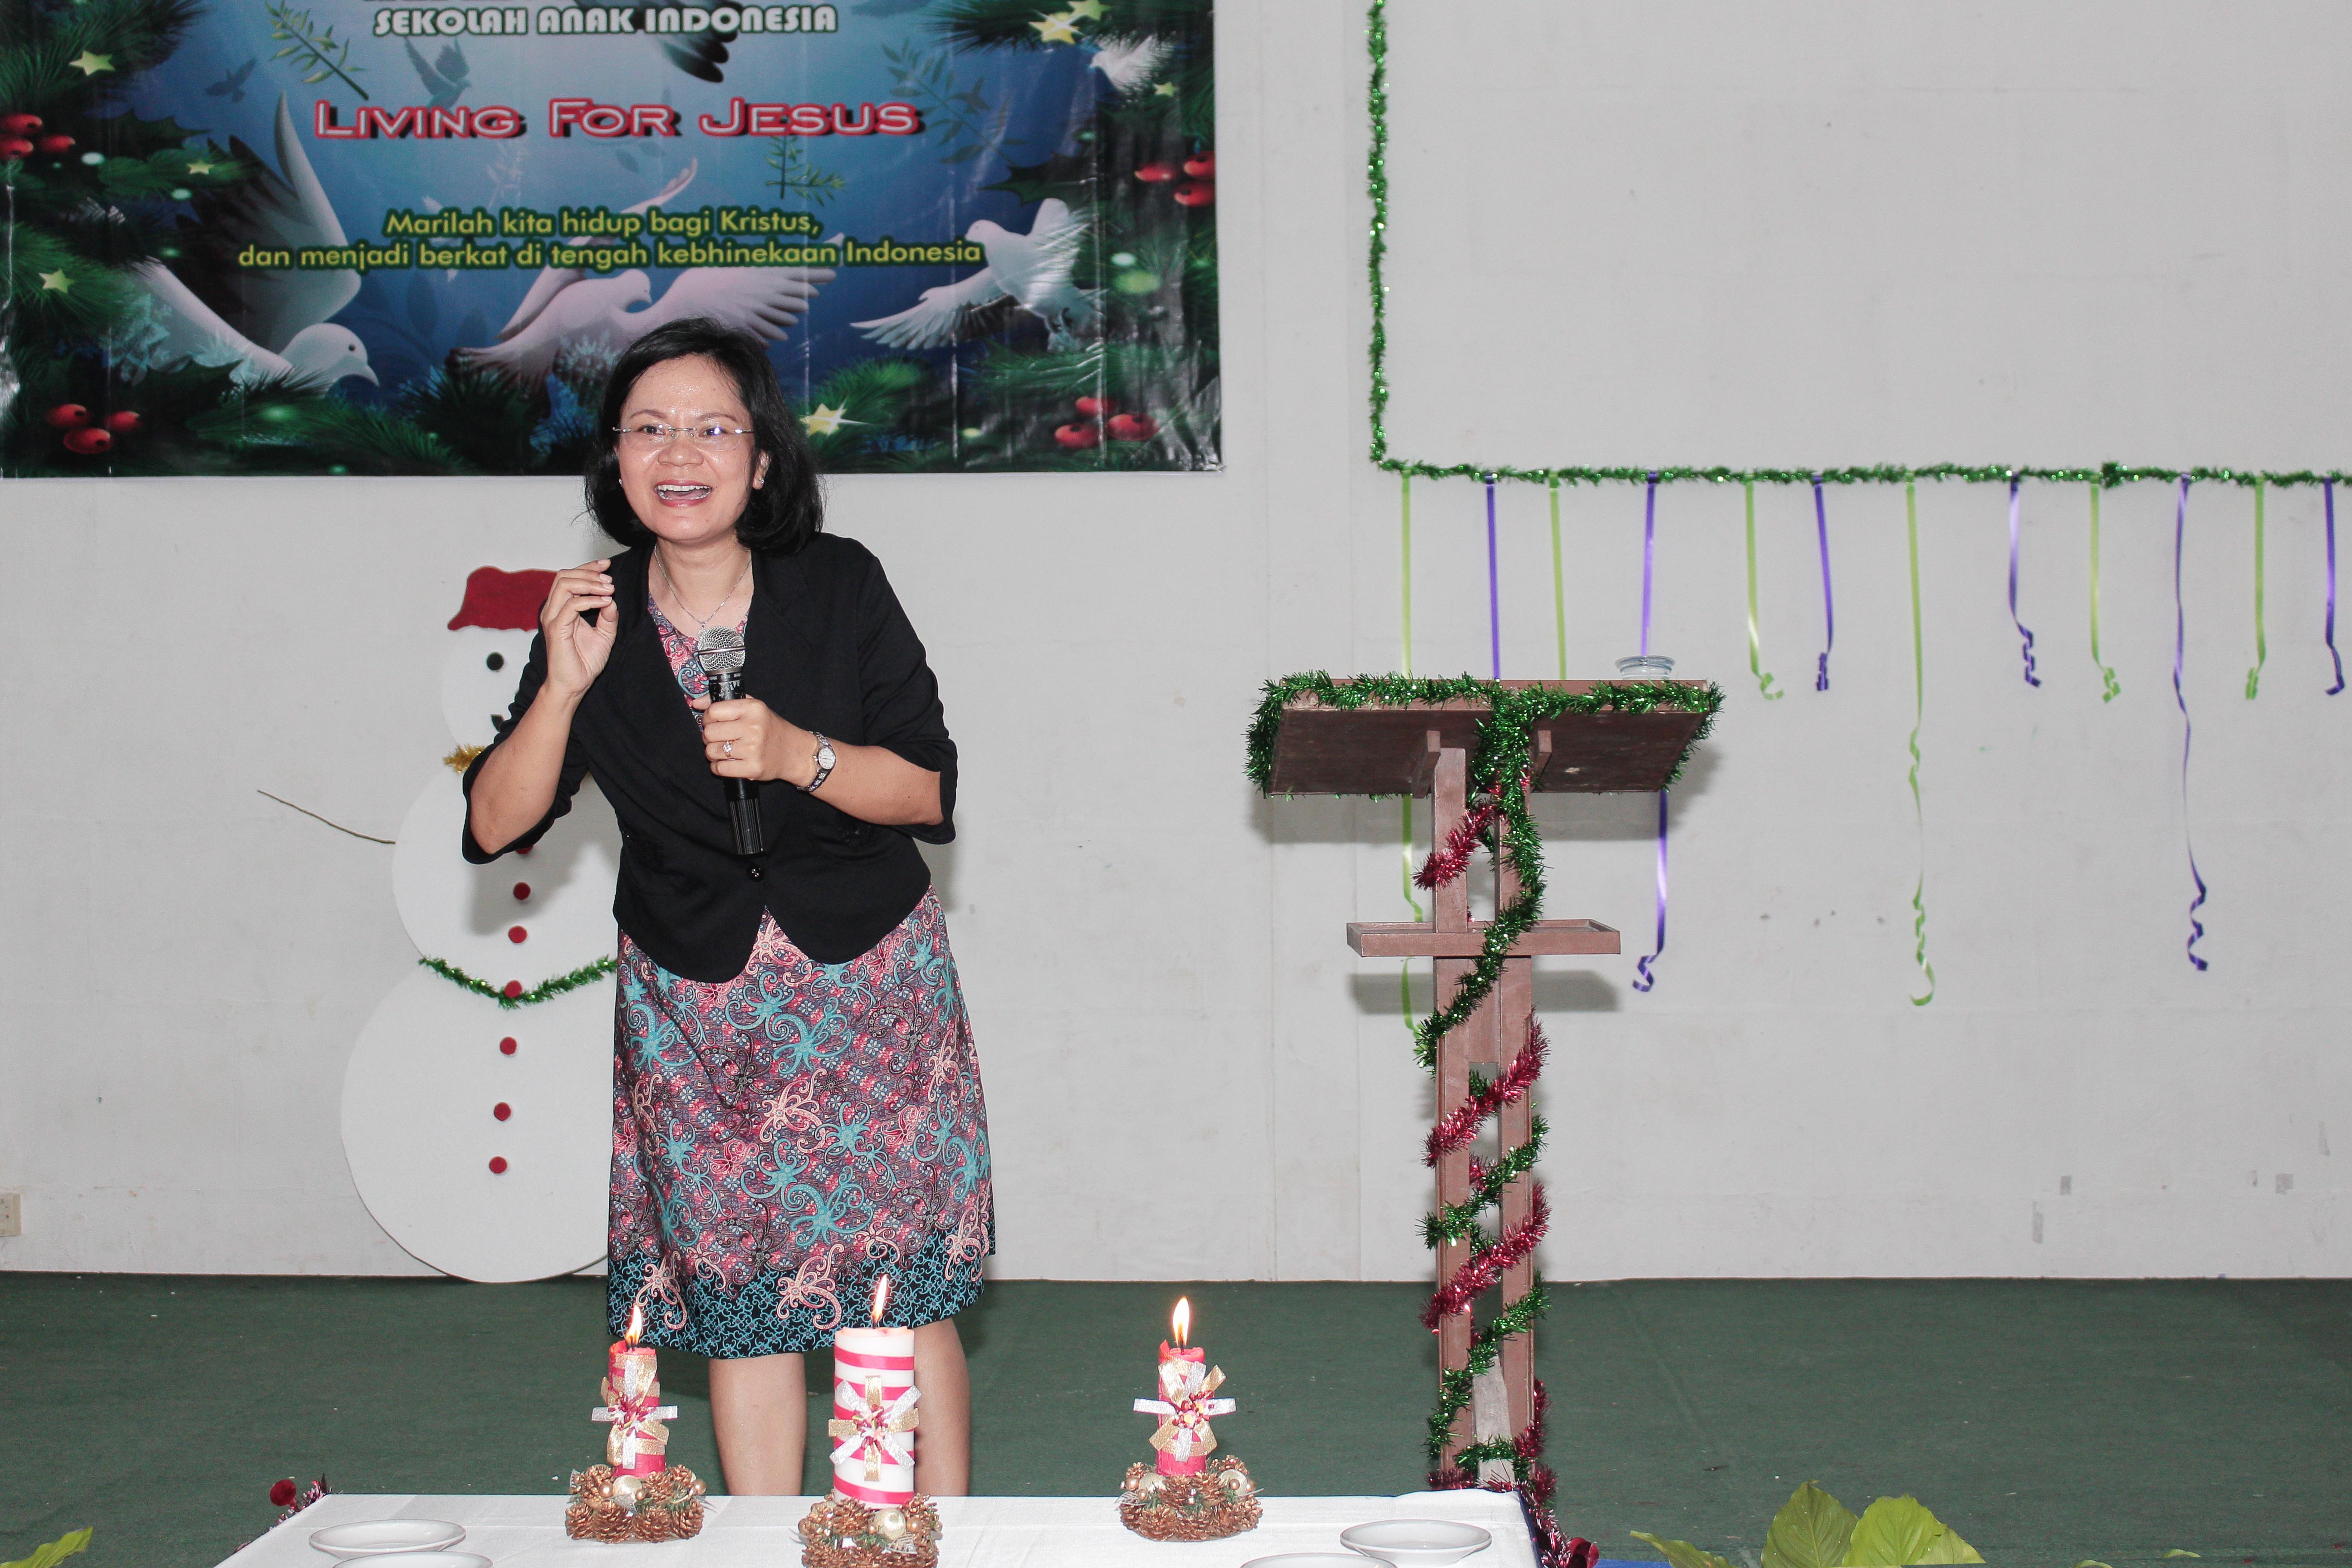 Sekolah anak inodoneia-Natal-sekolah papua-natal 2016-sekolah anak papua-perayaan natal papua